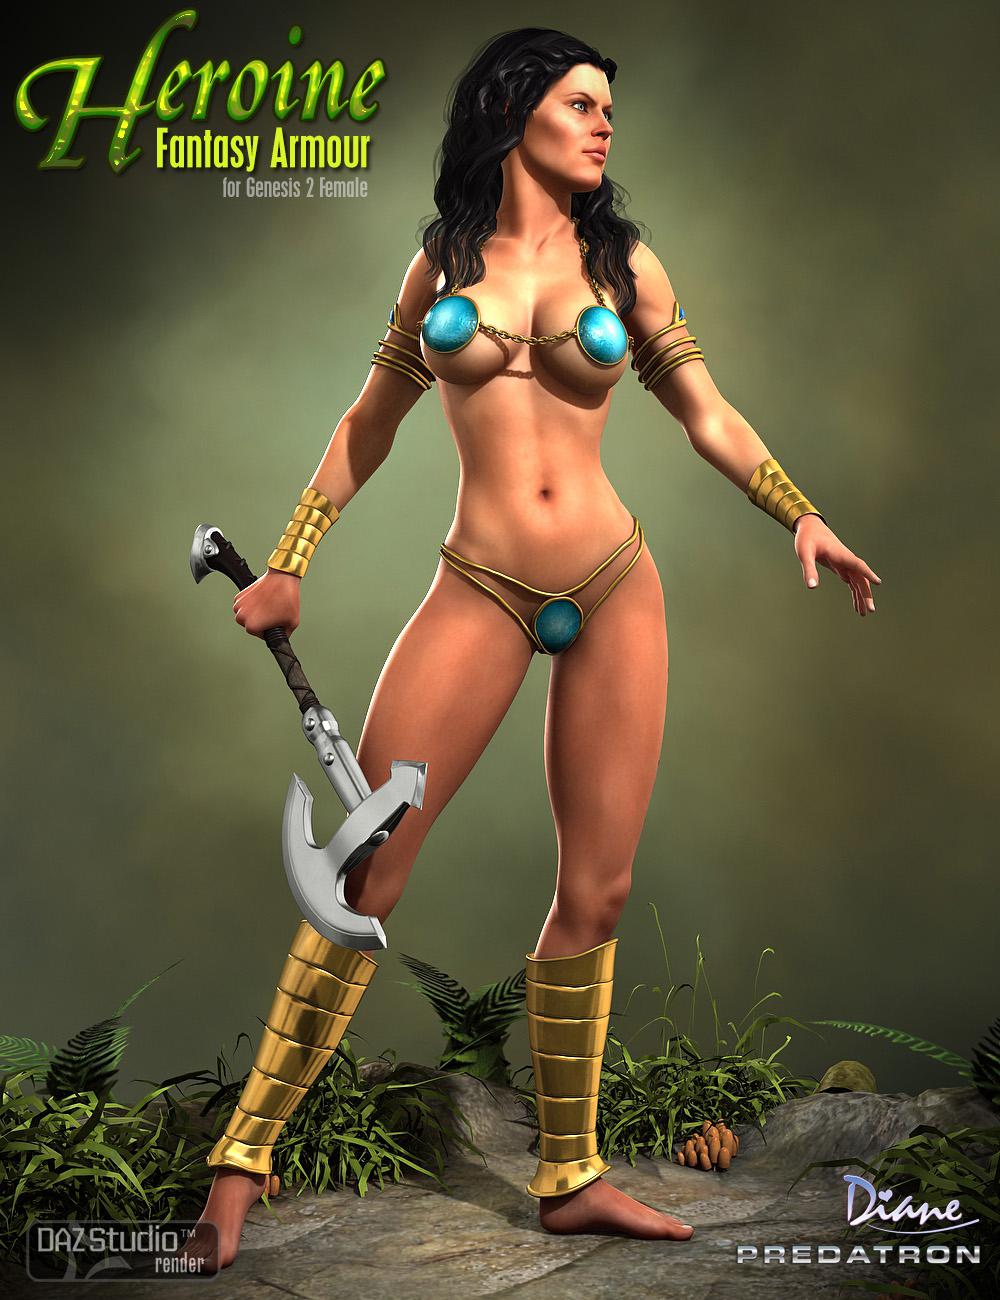 Heroine Fantasy Armour by: DianePredatron, 3D Models by Daz 3D